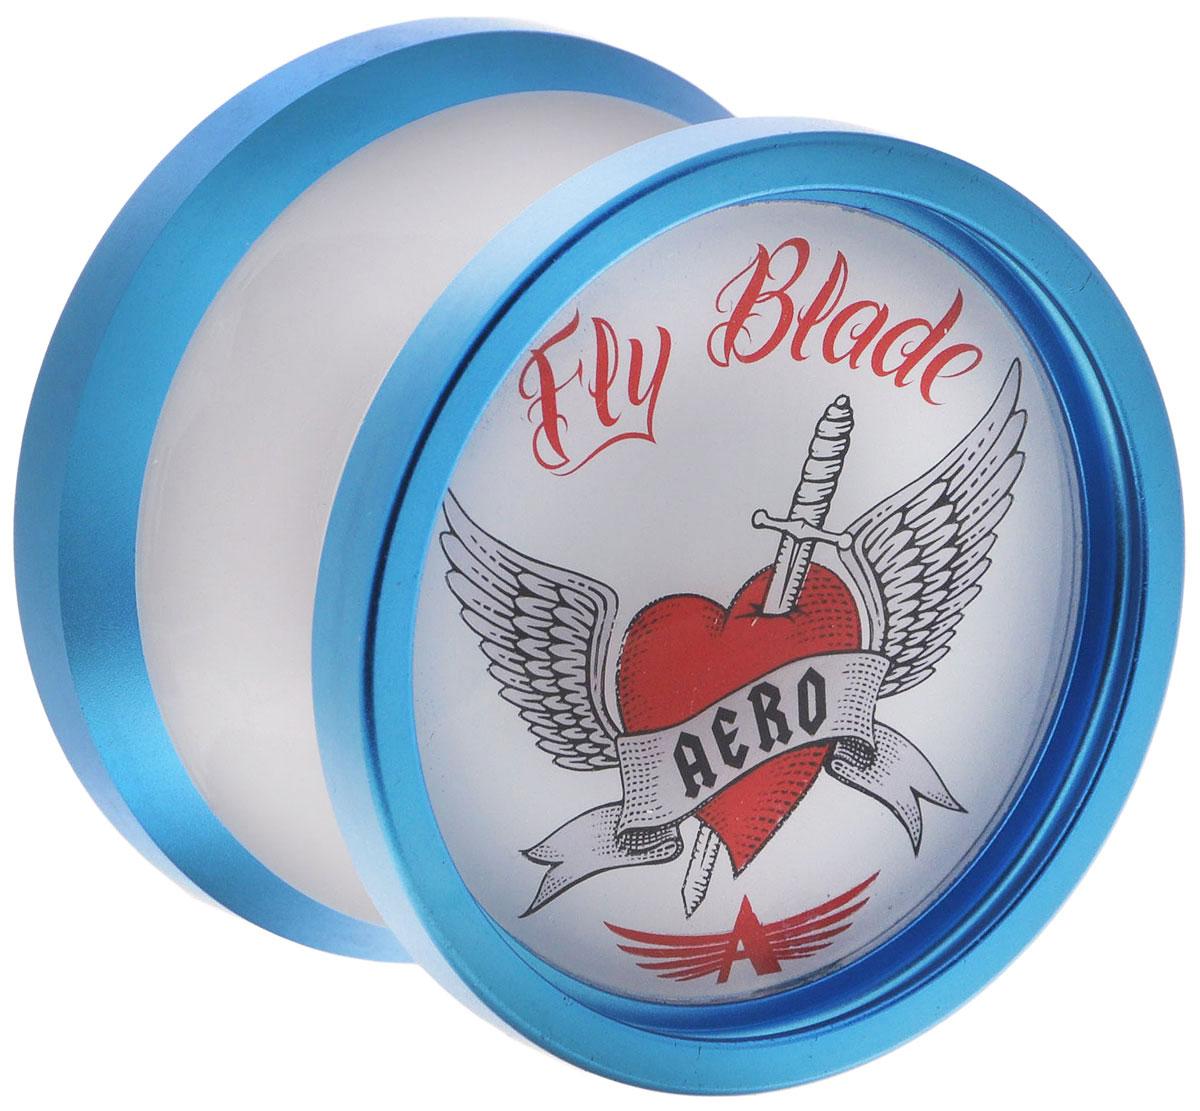 Aero-Yo Йо-йо Aero Fly Blade цвет синий